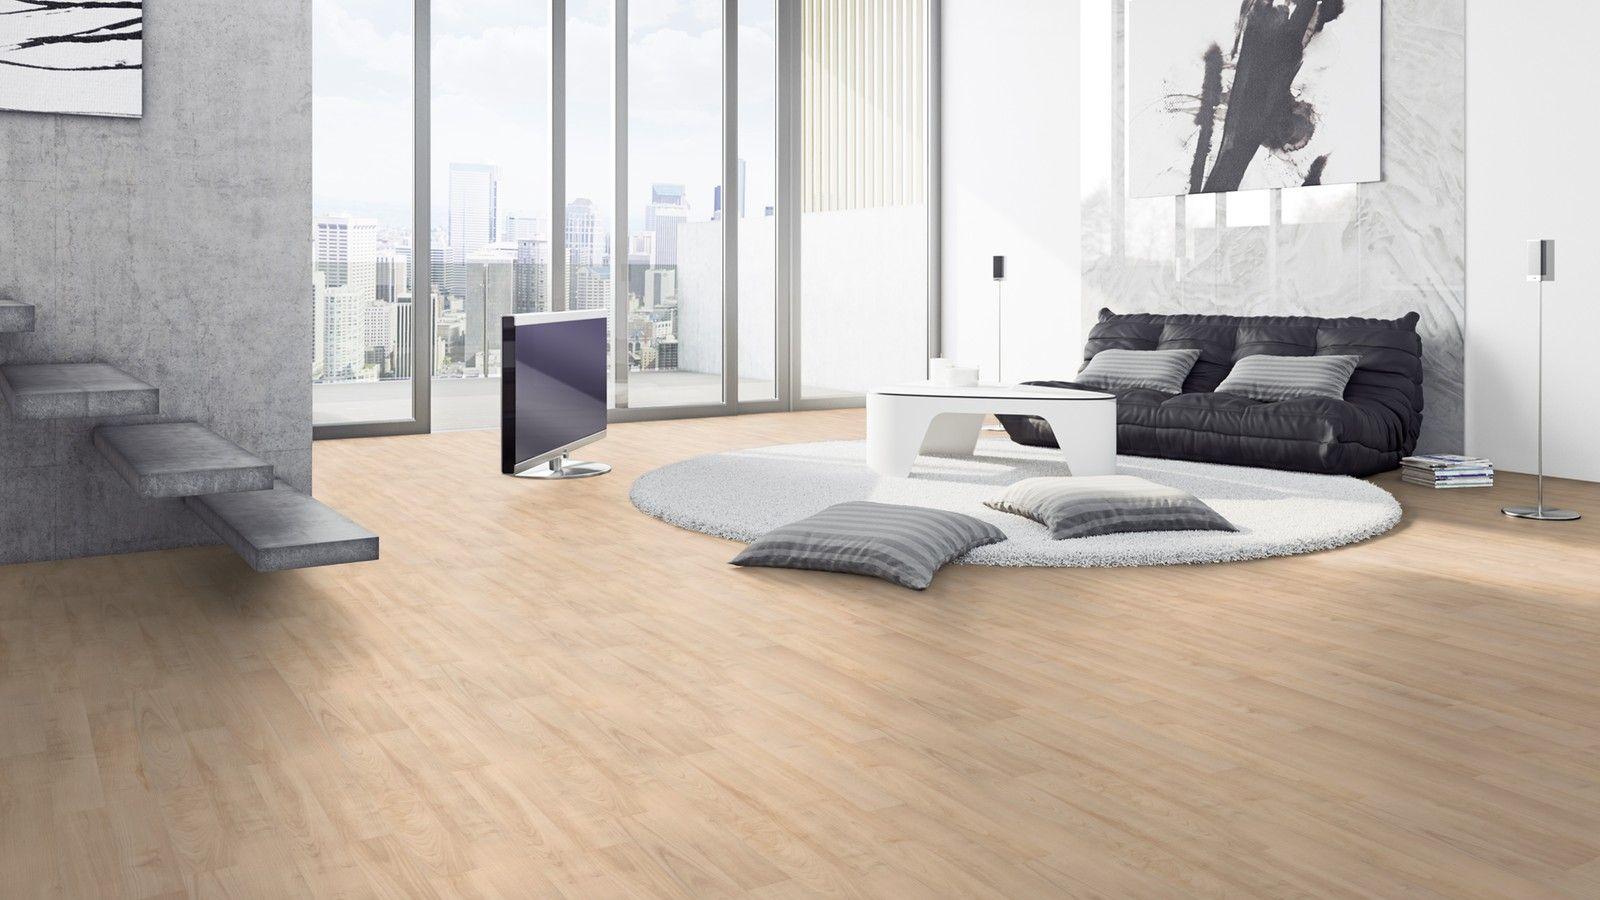 £22.50 sq m Avatara Maple Sand Beige ManMade Wood Floor